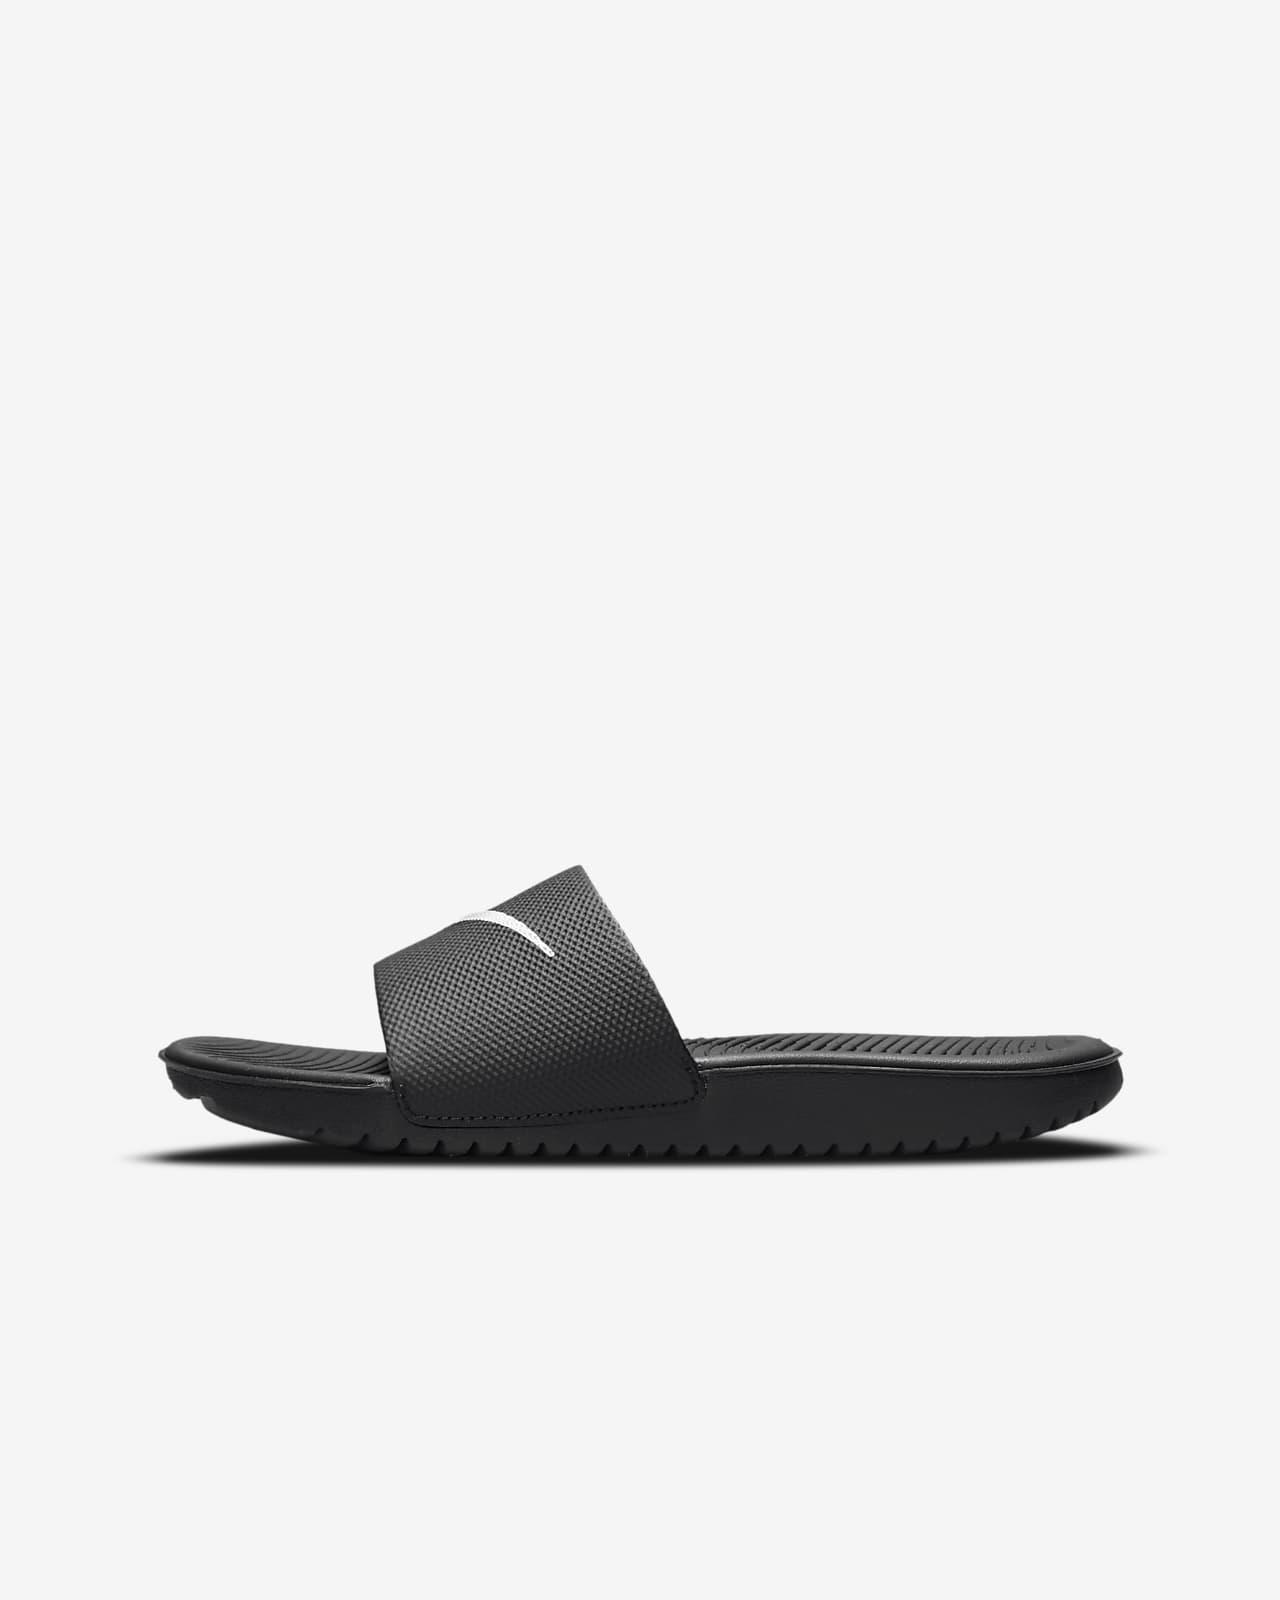 Nike Kawa - badesandal til små/store børn